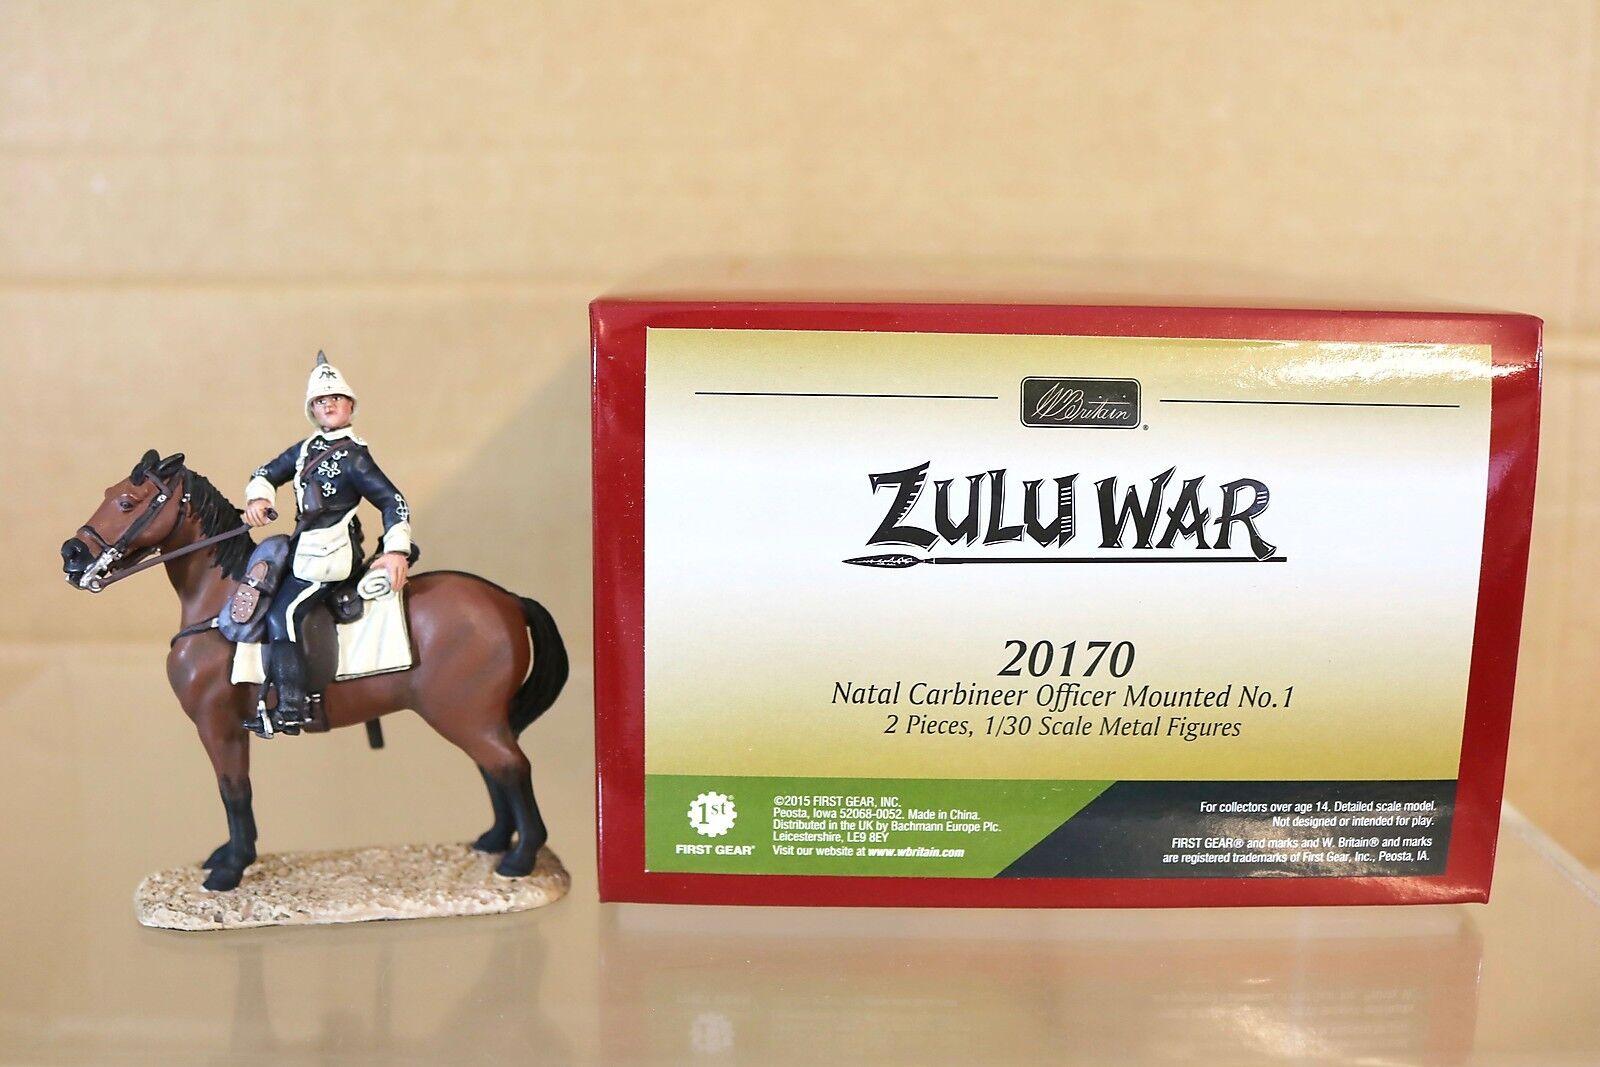 BRITAINS 20170 ZULU WAR NATAL CARBINEER MOUNTED OFFICER No 1 MINT BOXED nq